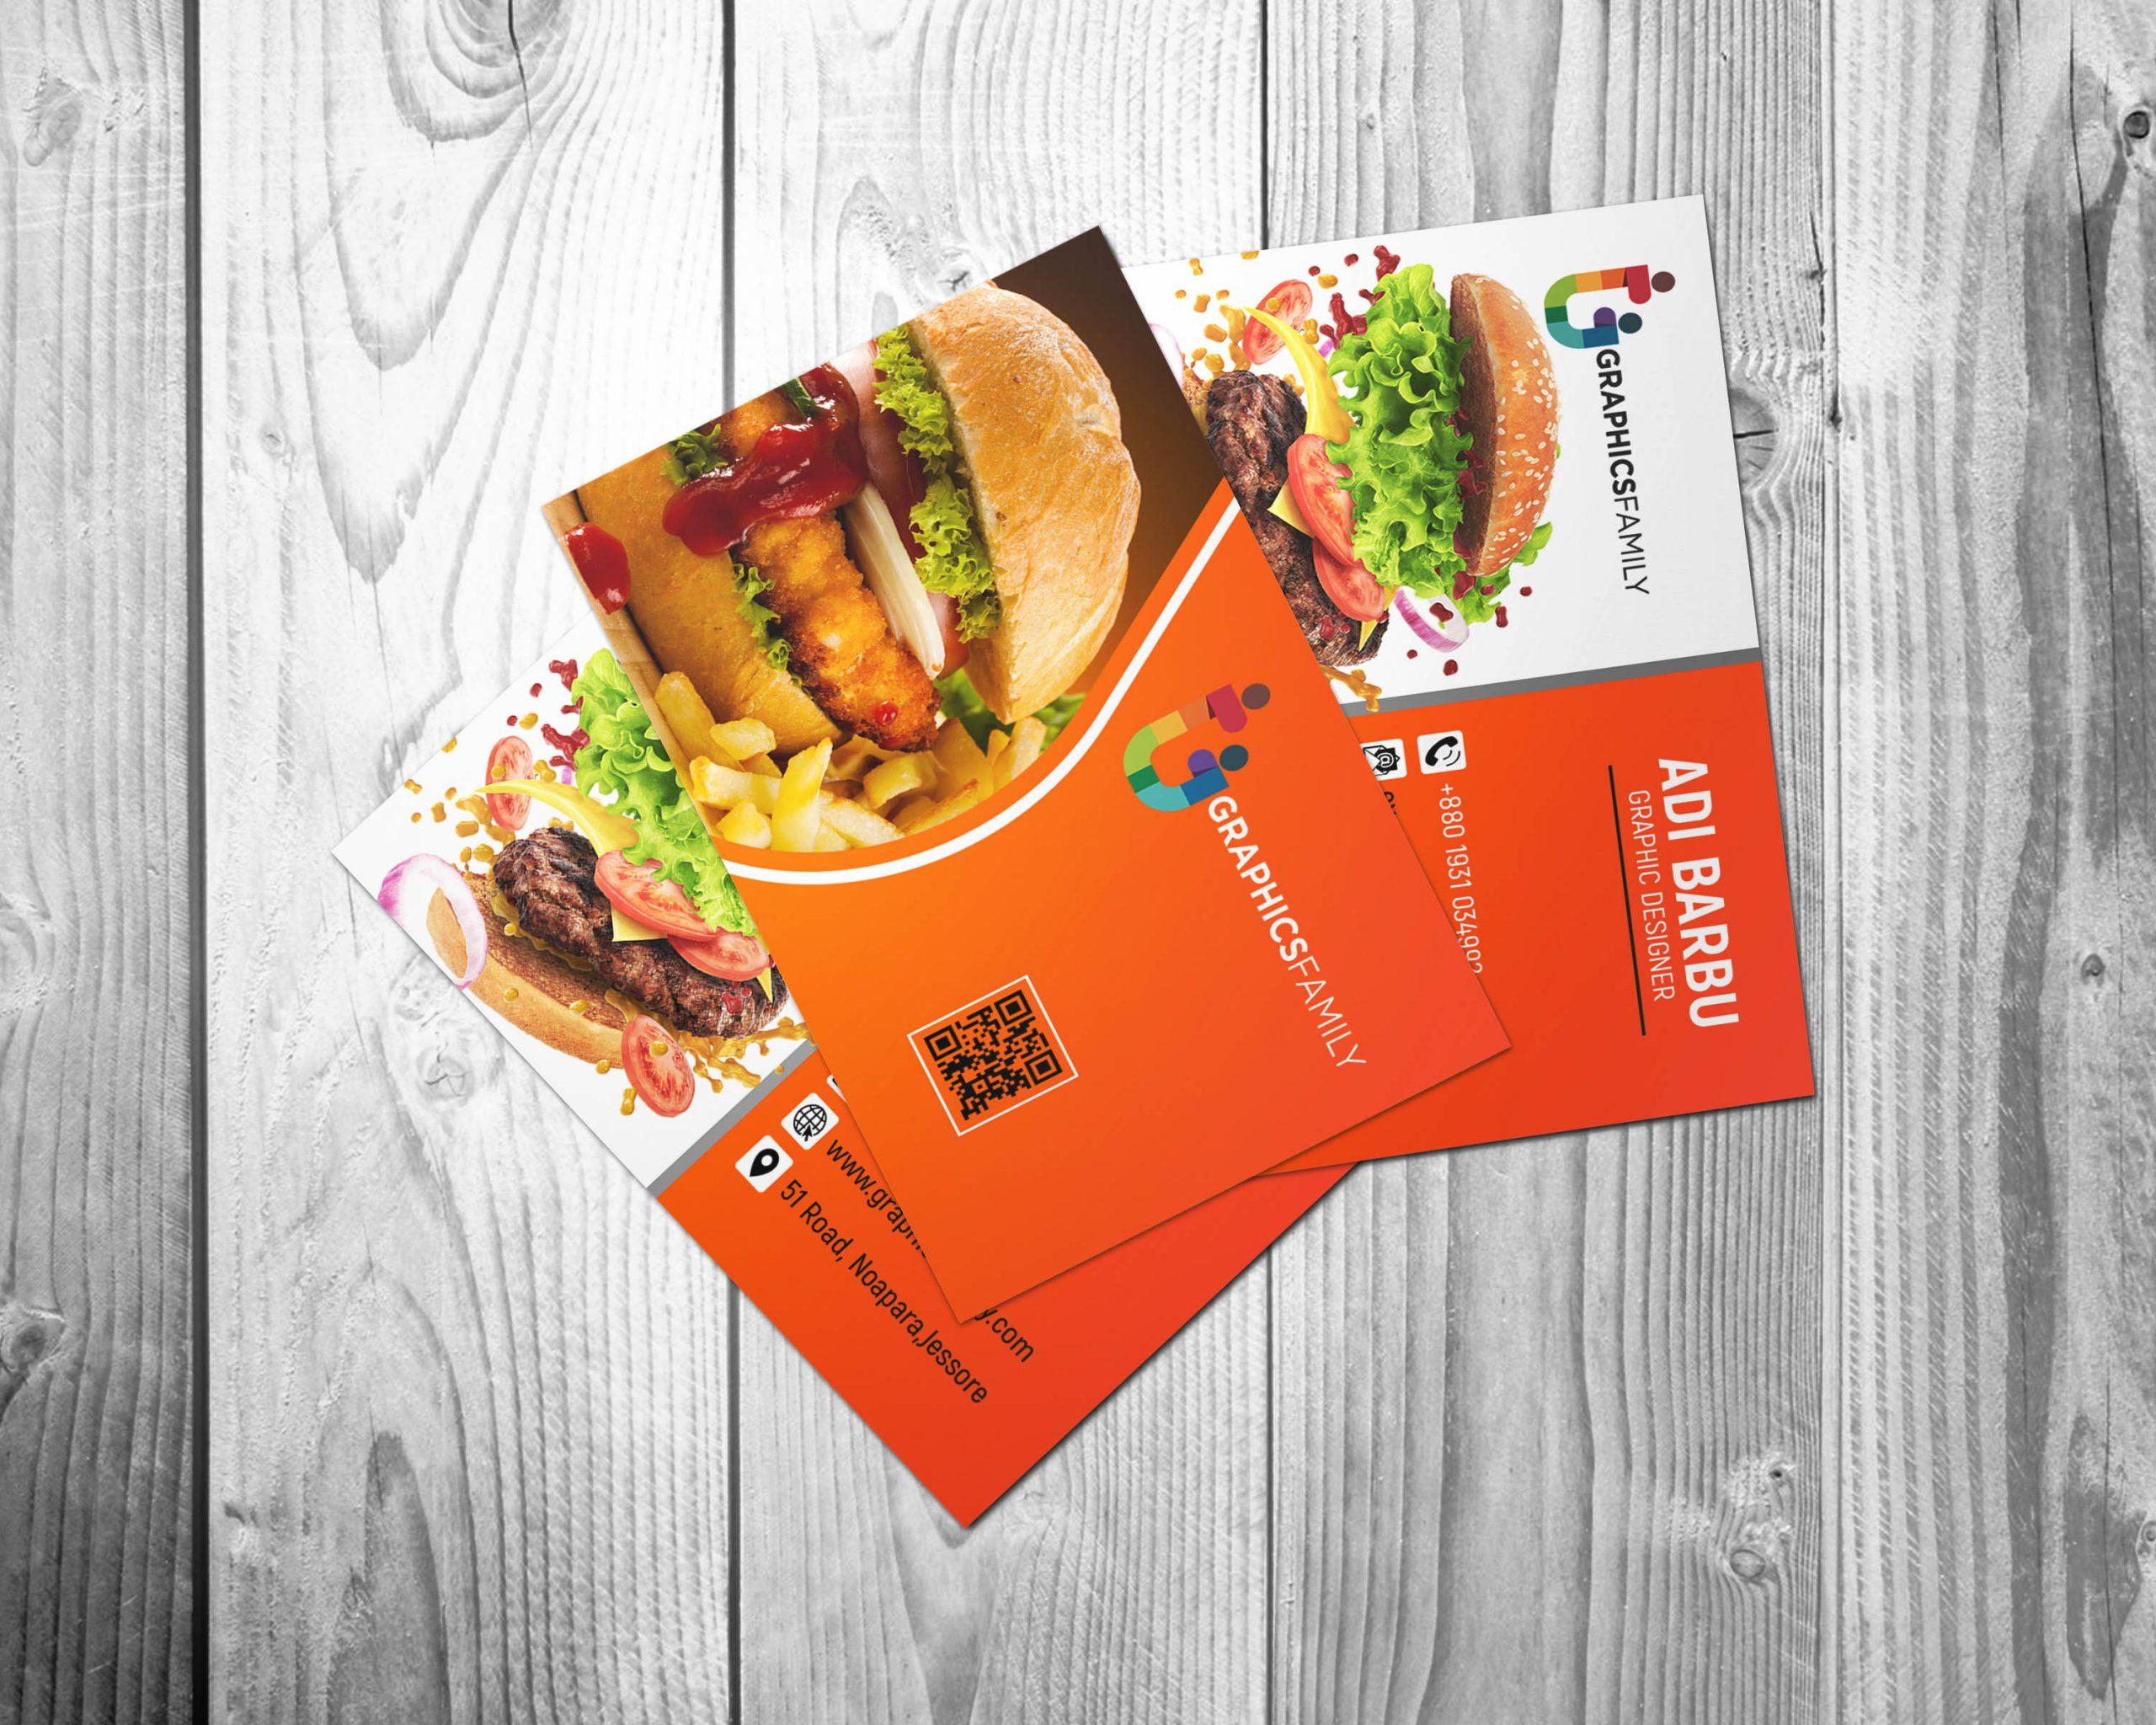 Food Company Visiting Card Design Download